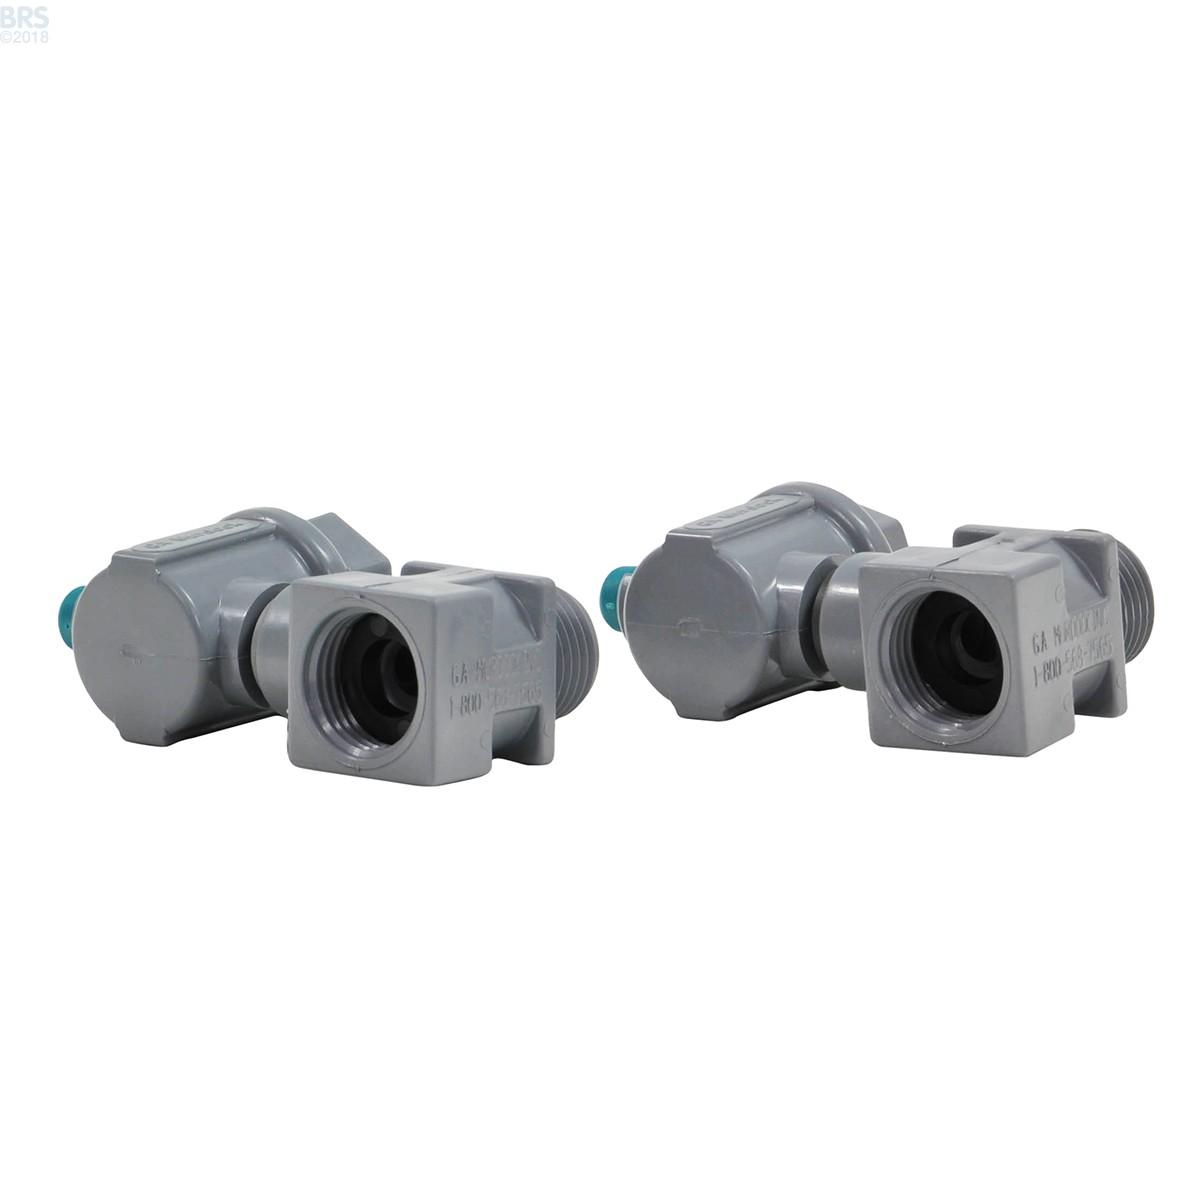 Mur-Lok EZ Faucet Adapter Kit - Bulk Reef Supply